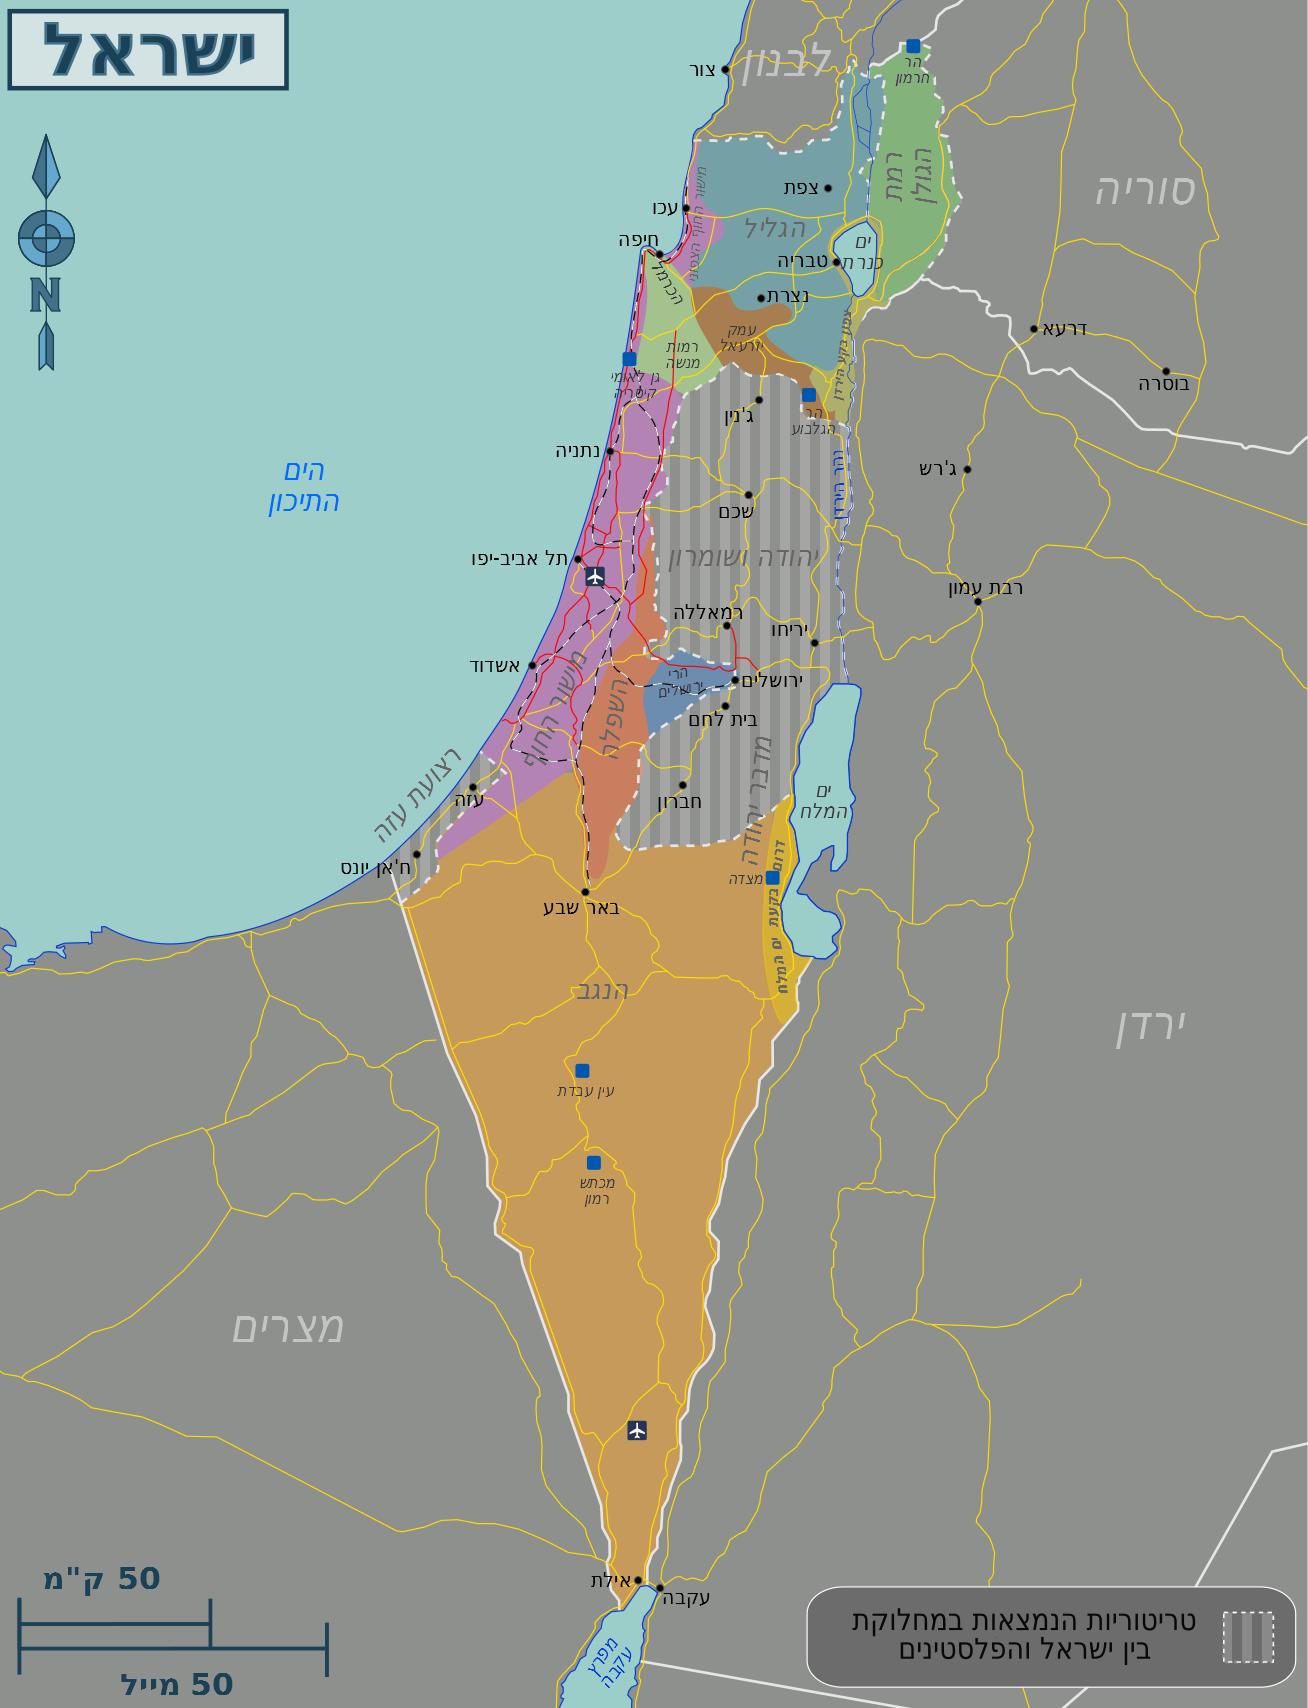 Fileisrael map hebrew wv heg wikimedia commons fileisrael map hebrew wv heg sciox Gallery